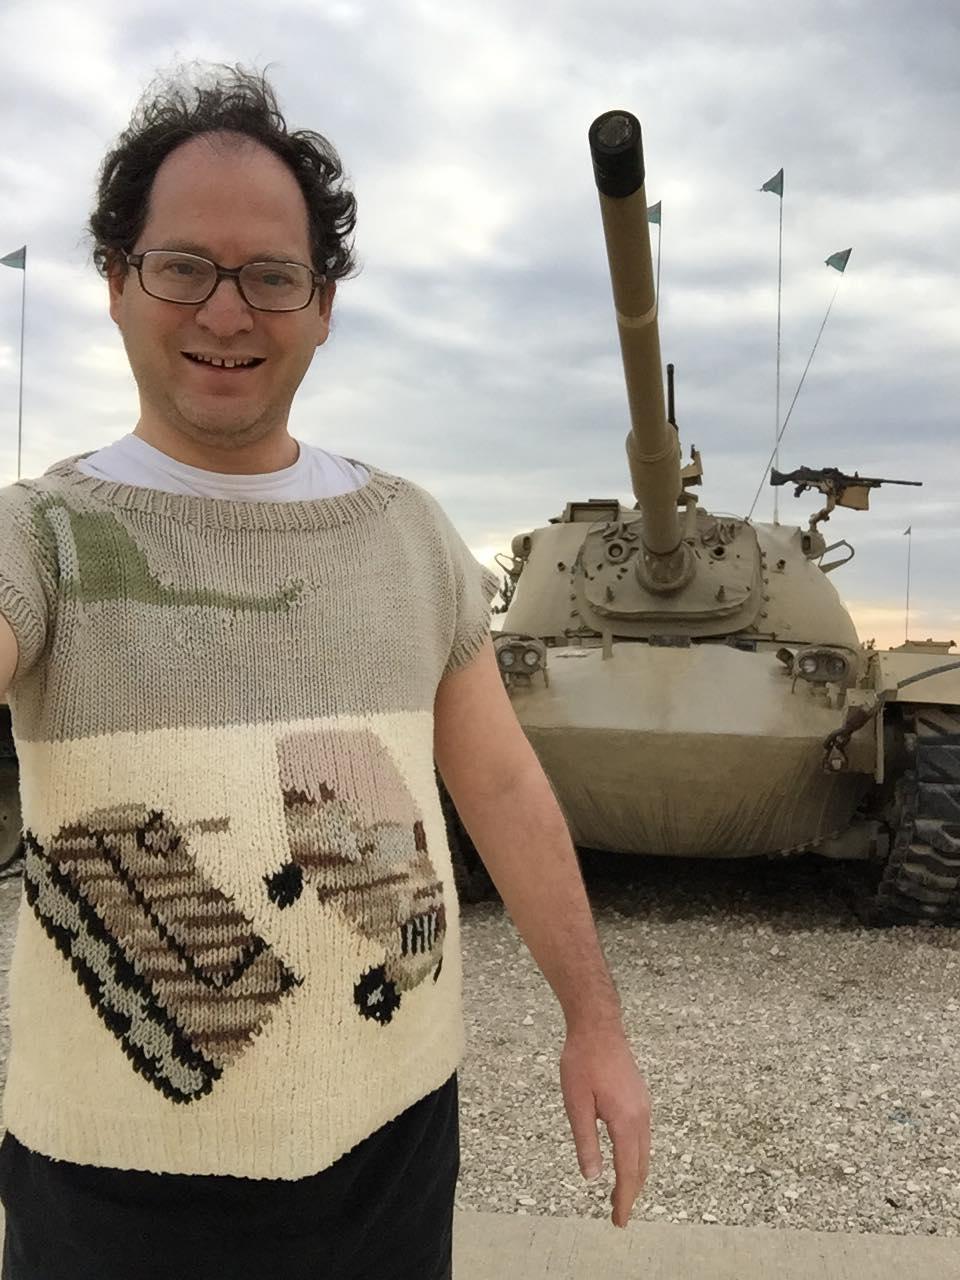 Sweater goals: Wearable travel stories of Sam Barsky | prettyugly.eu